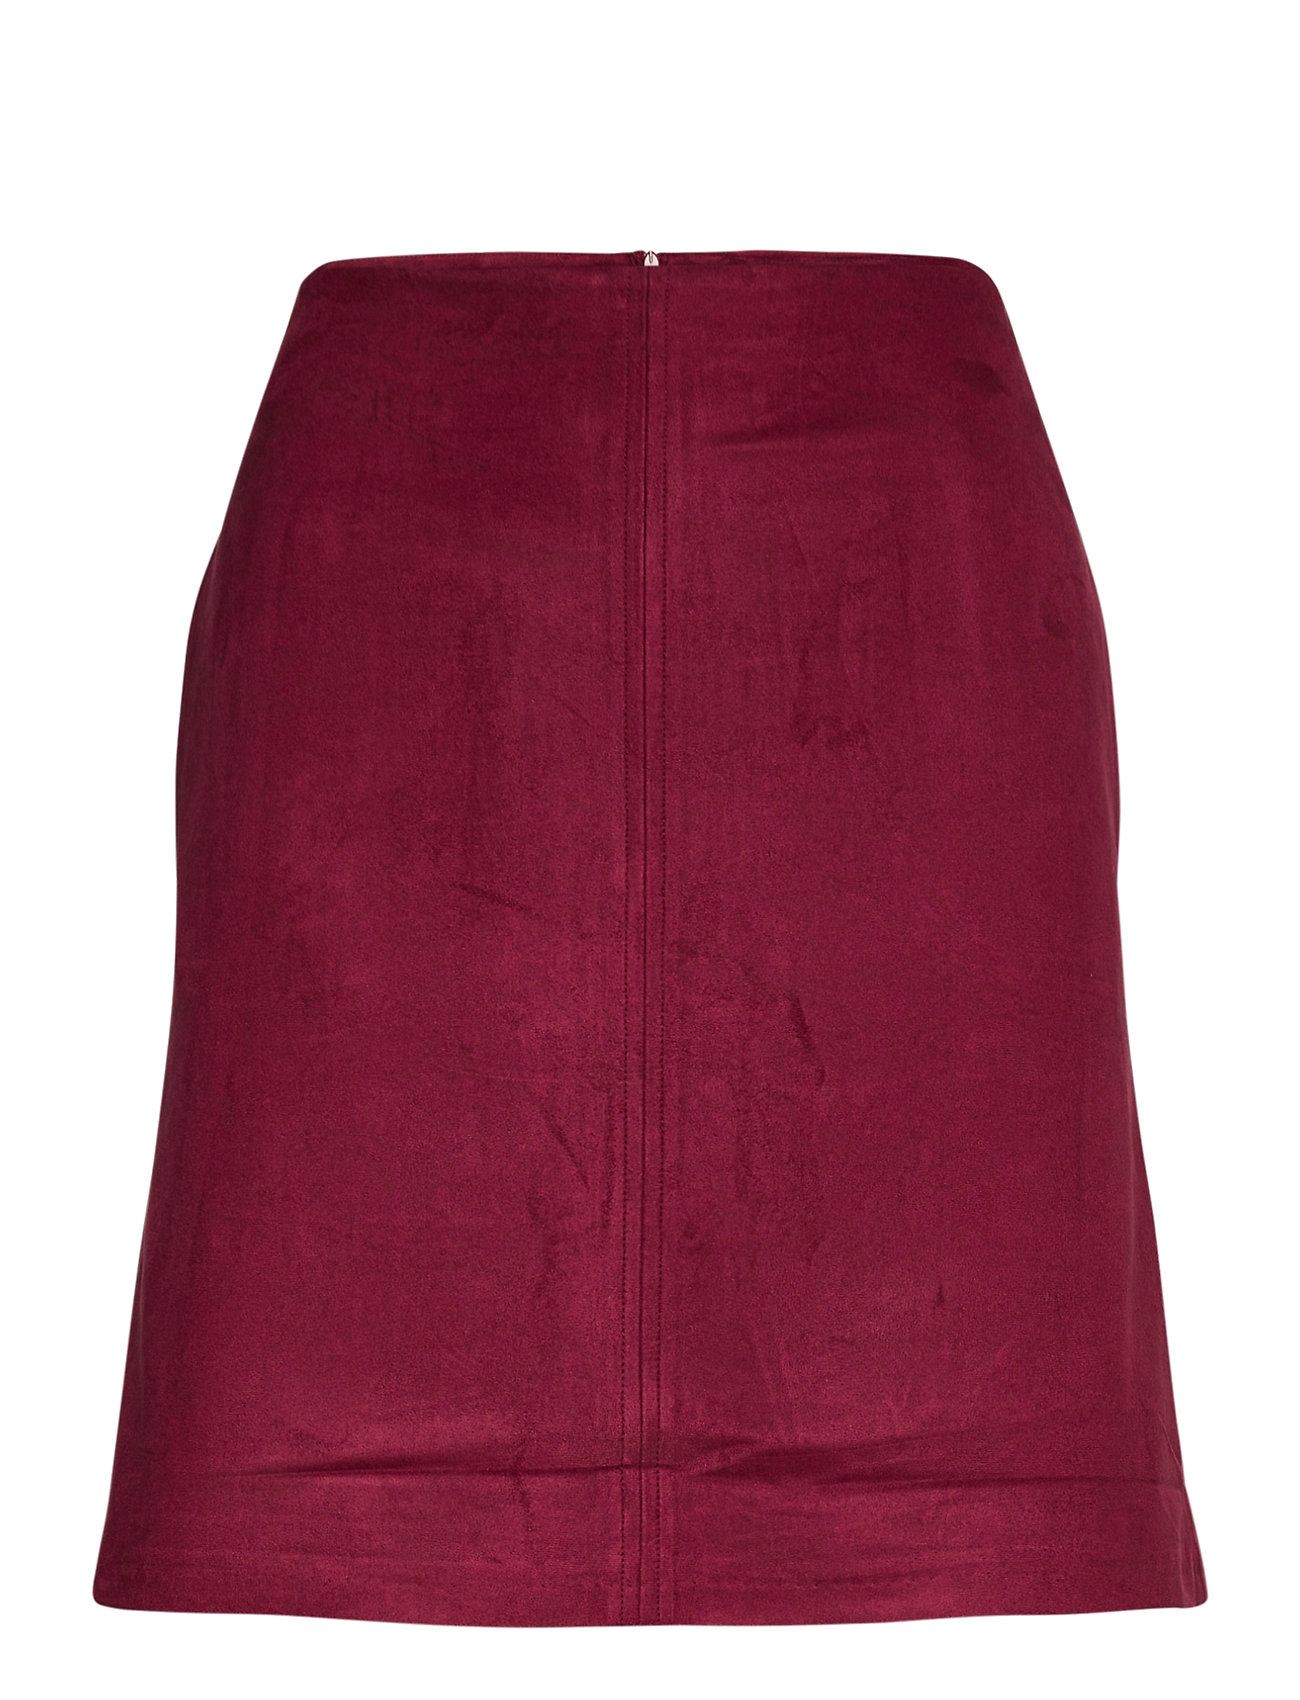 Image of Skirts Woven Kort Nederdel Rød Esprit Casual (3448709187)